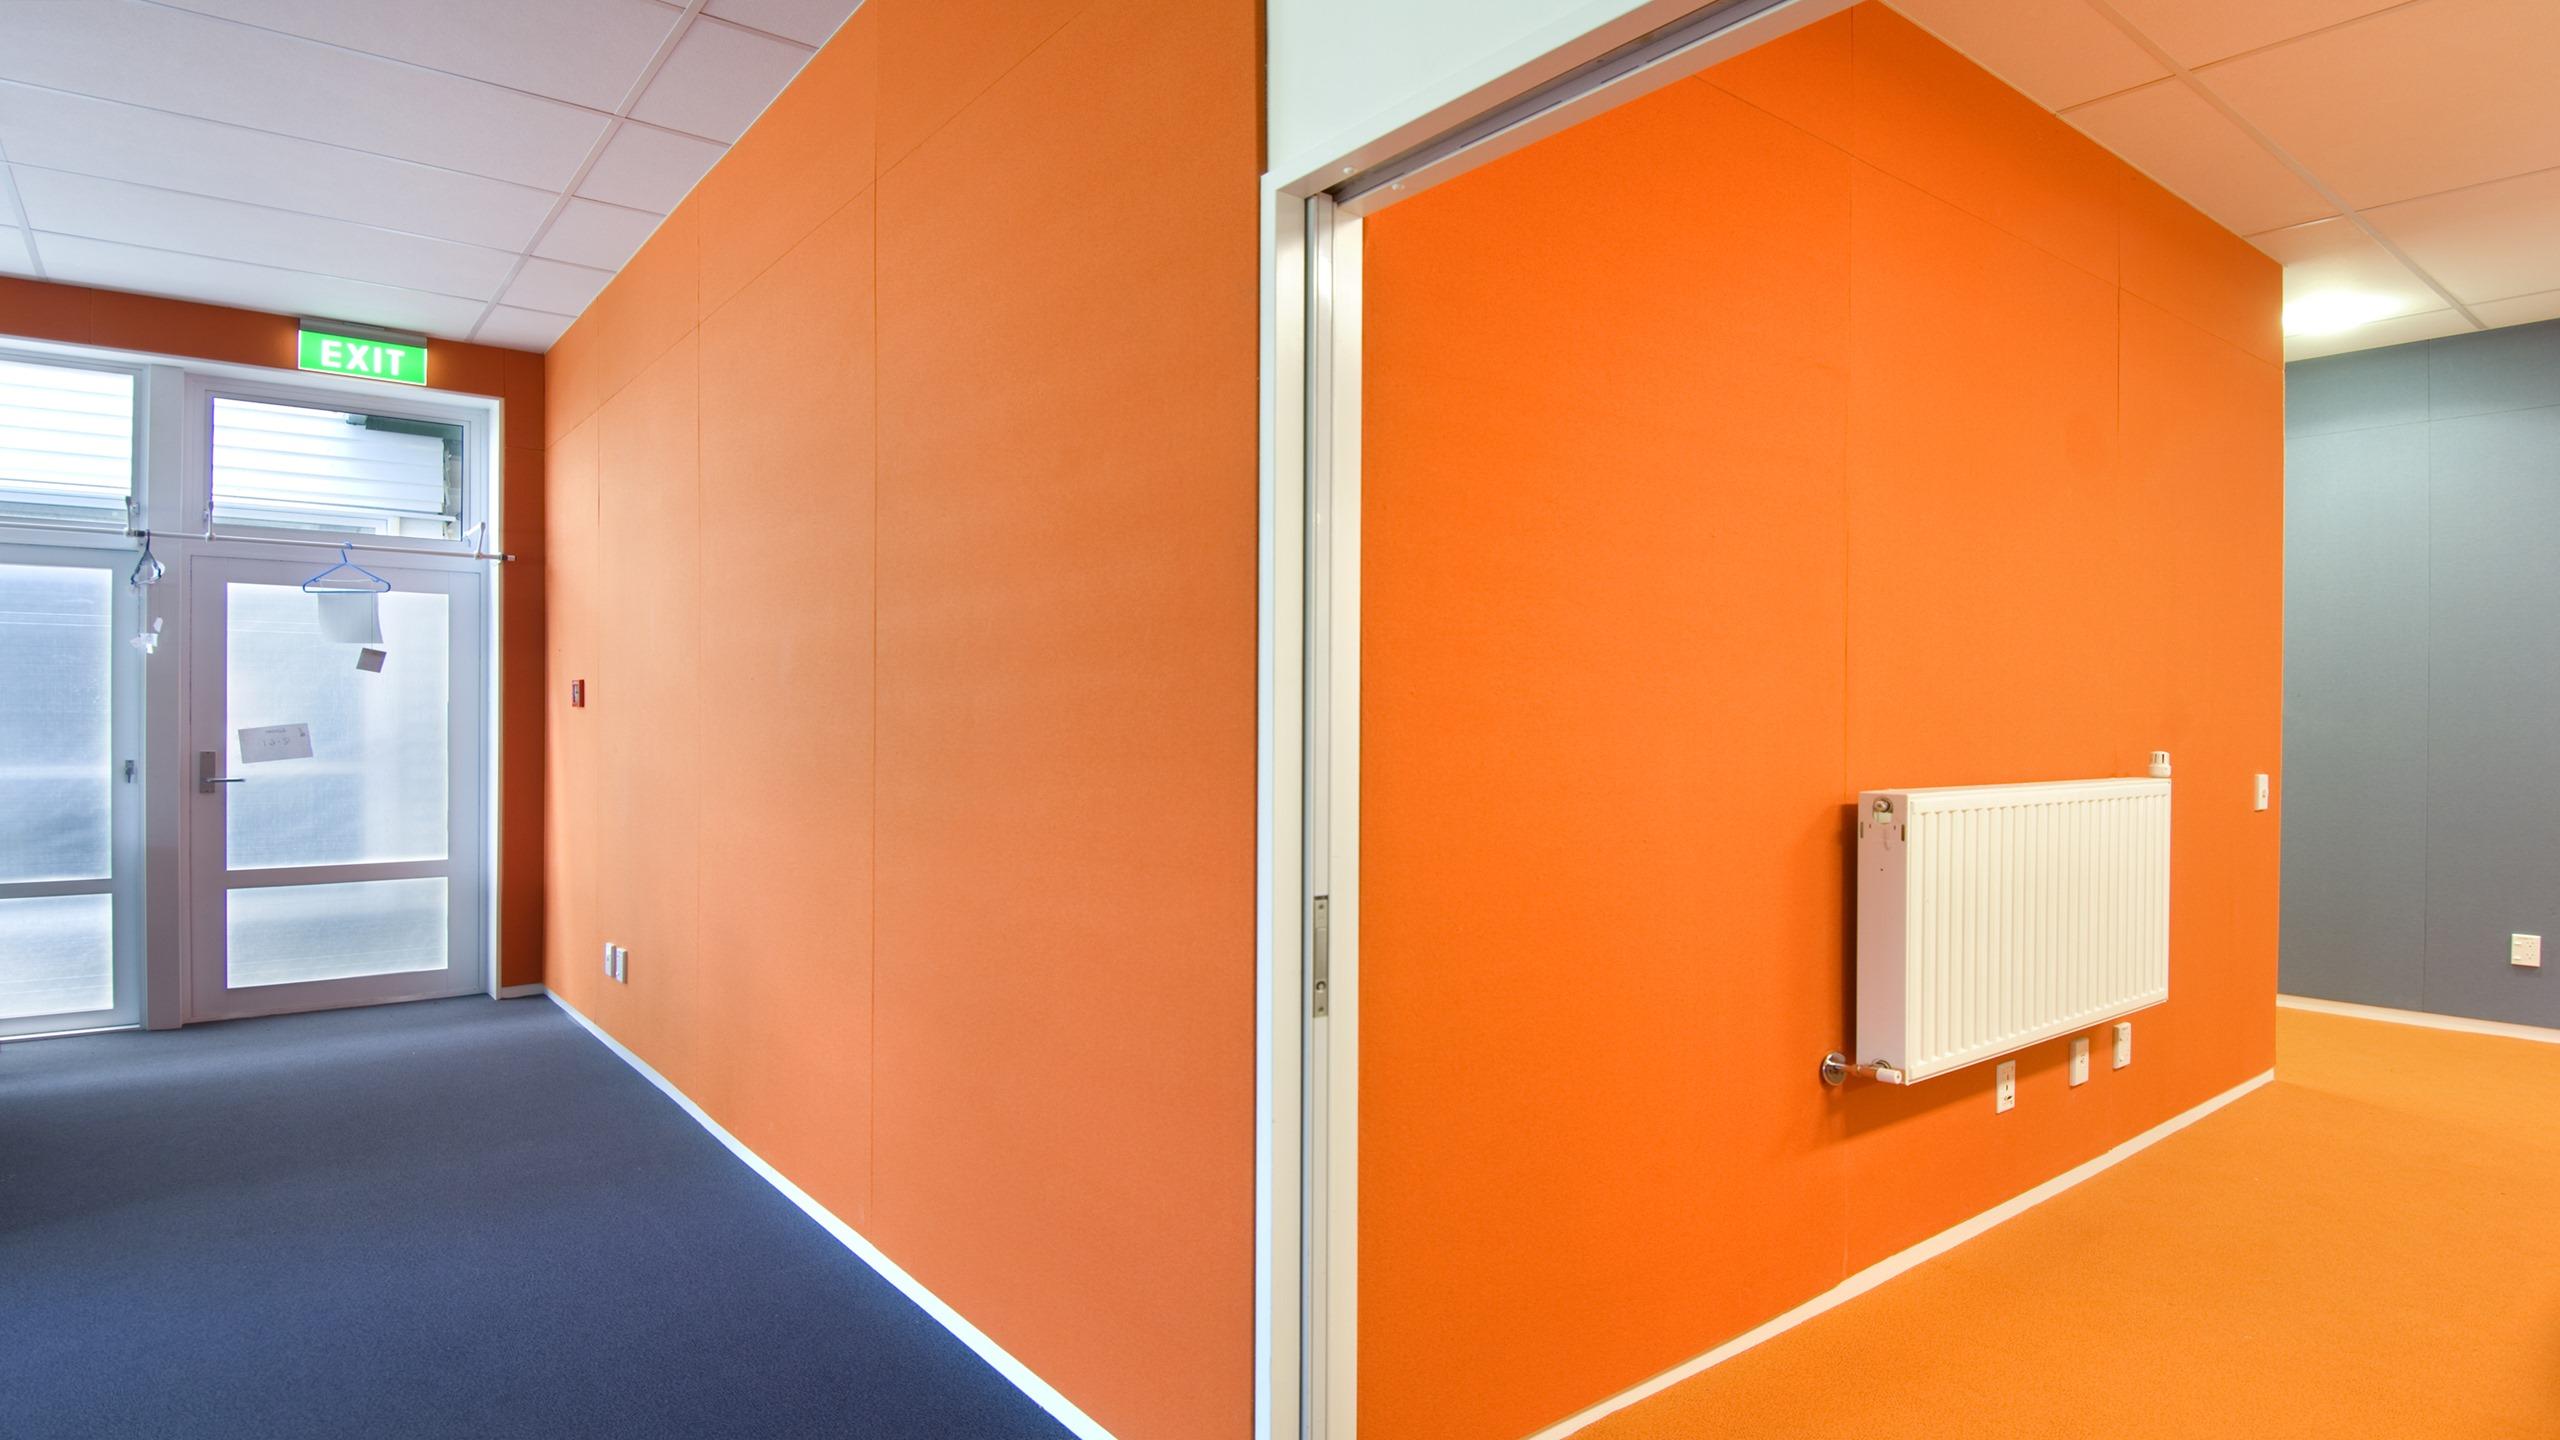 Premier Pinboard in orange fabric installed on to walls in a school hallway.